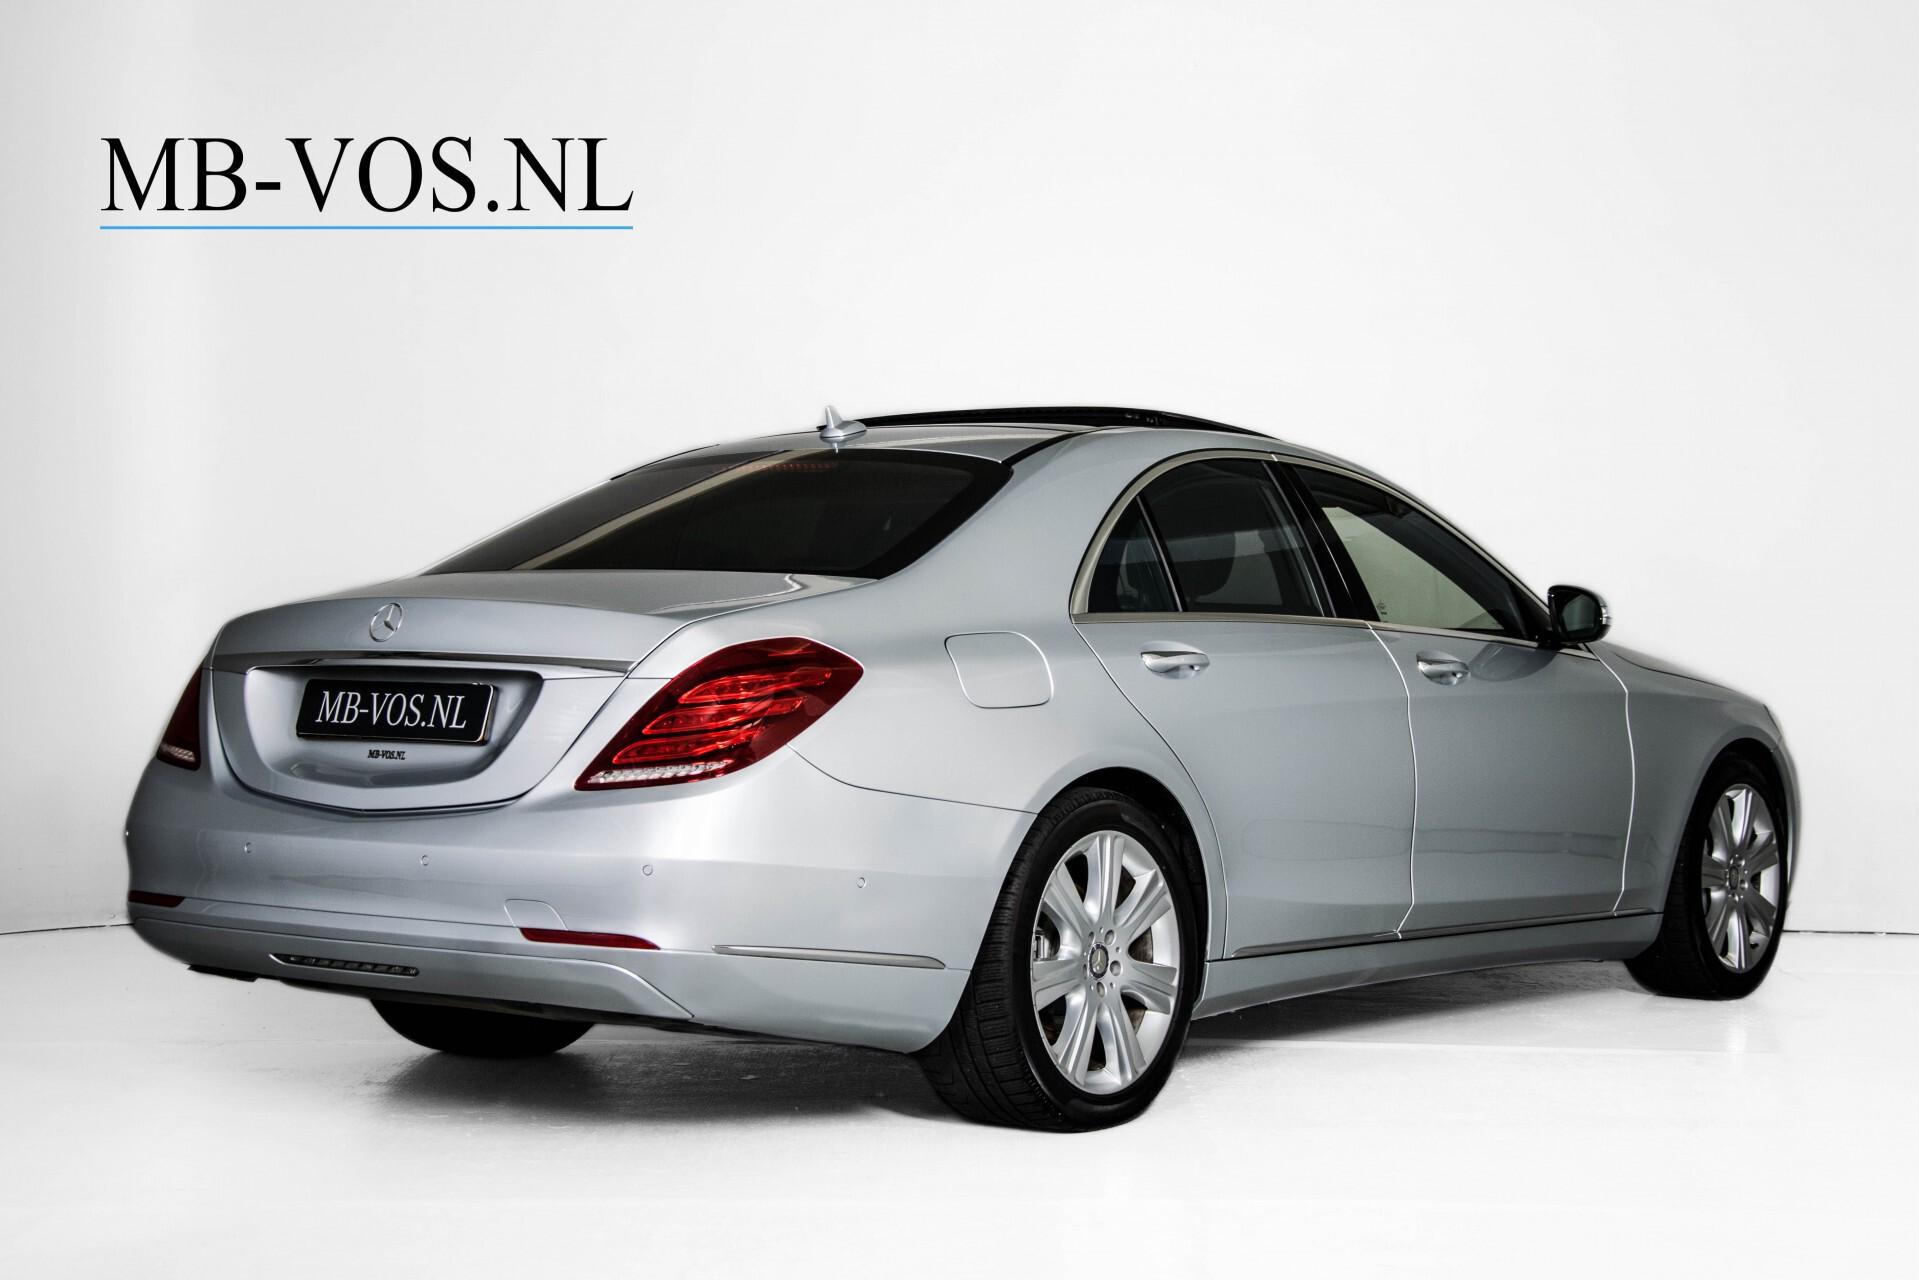 Mercedes-Benz S-Klasse 350 Bluetec Exclusive Panorama/Massage/Keyless/Distronic/Standkachel Aut7 Foto 2